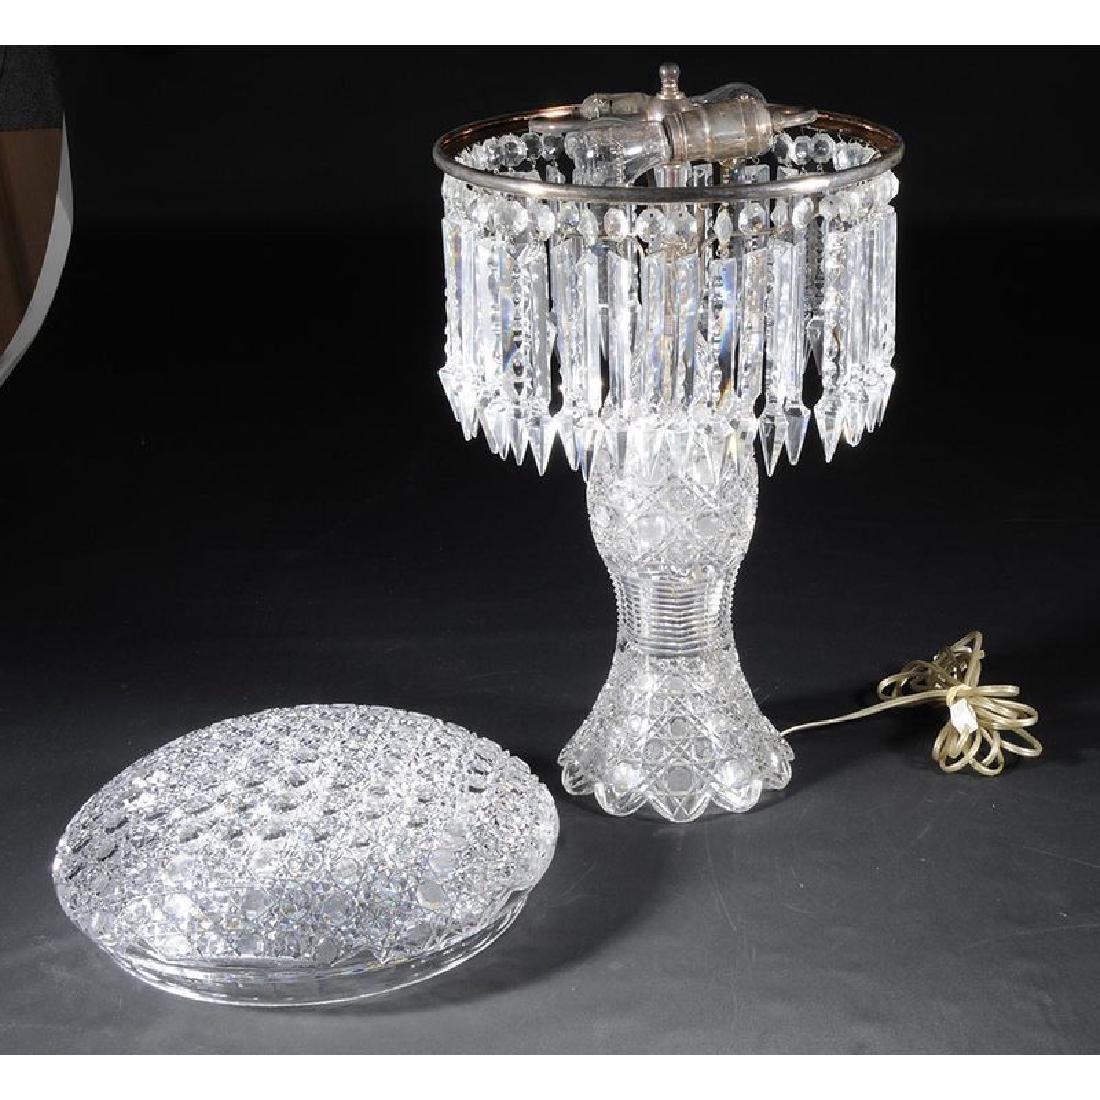 Brilliant Period Cut Glass Table Lamp - 3